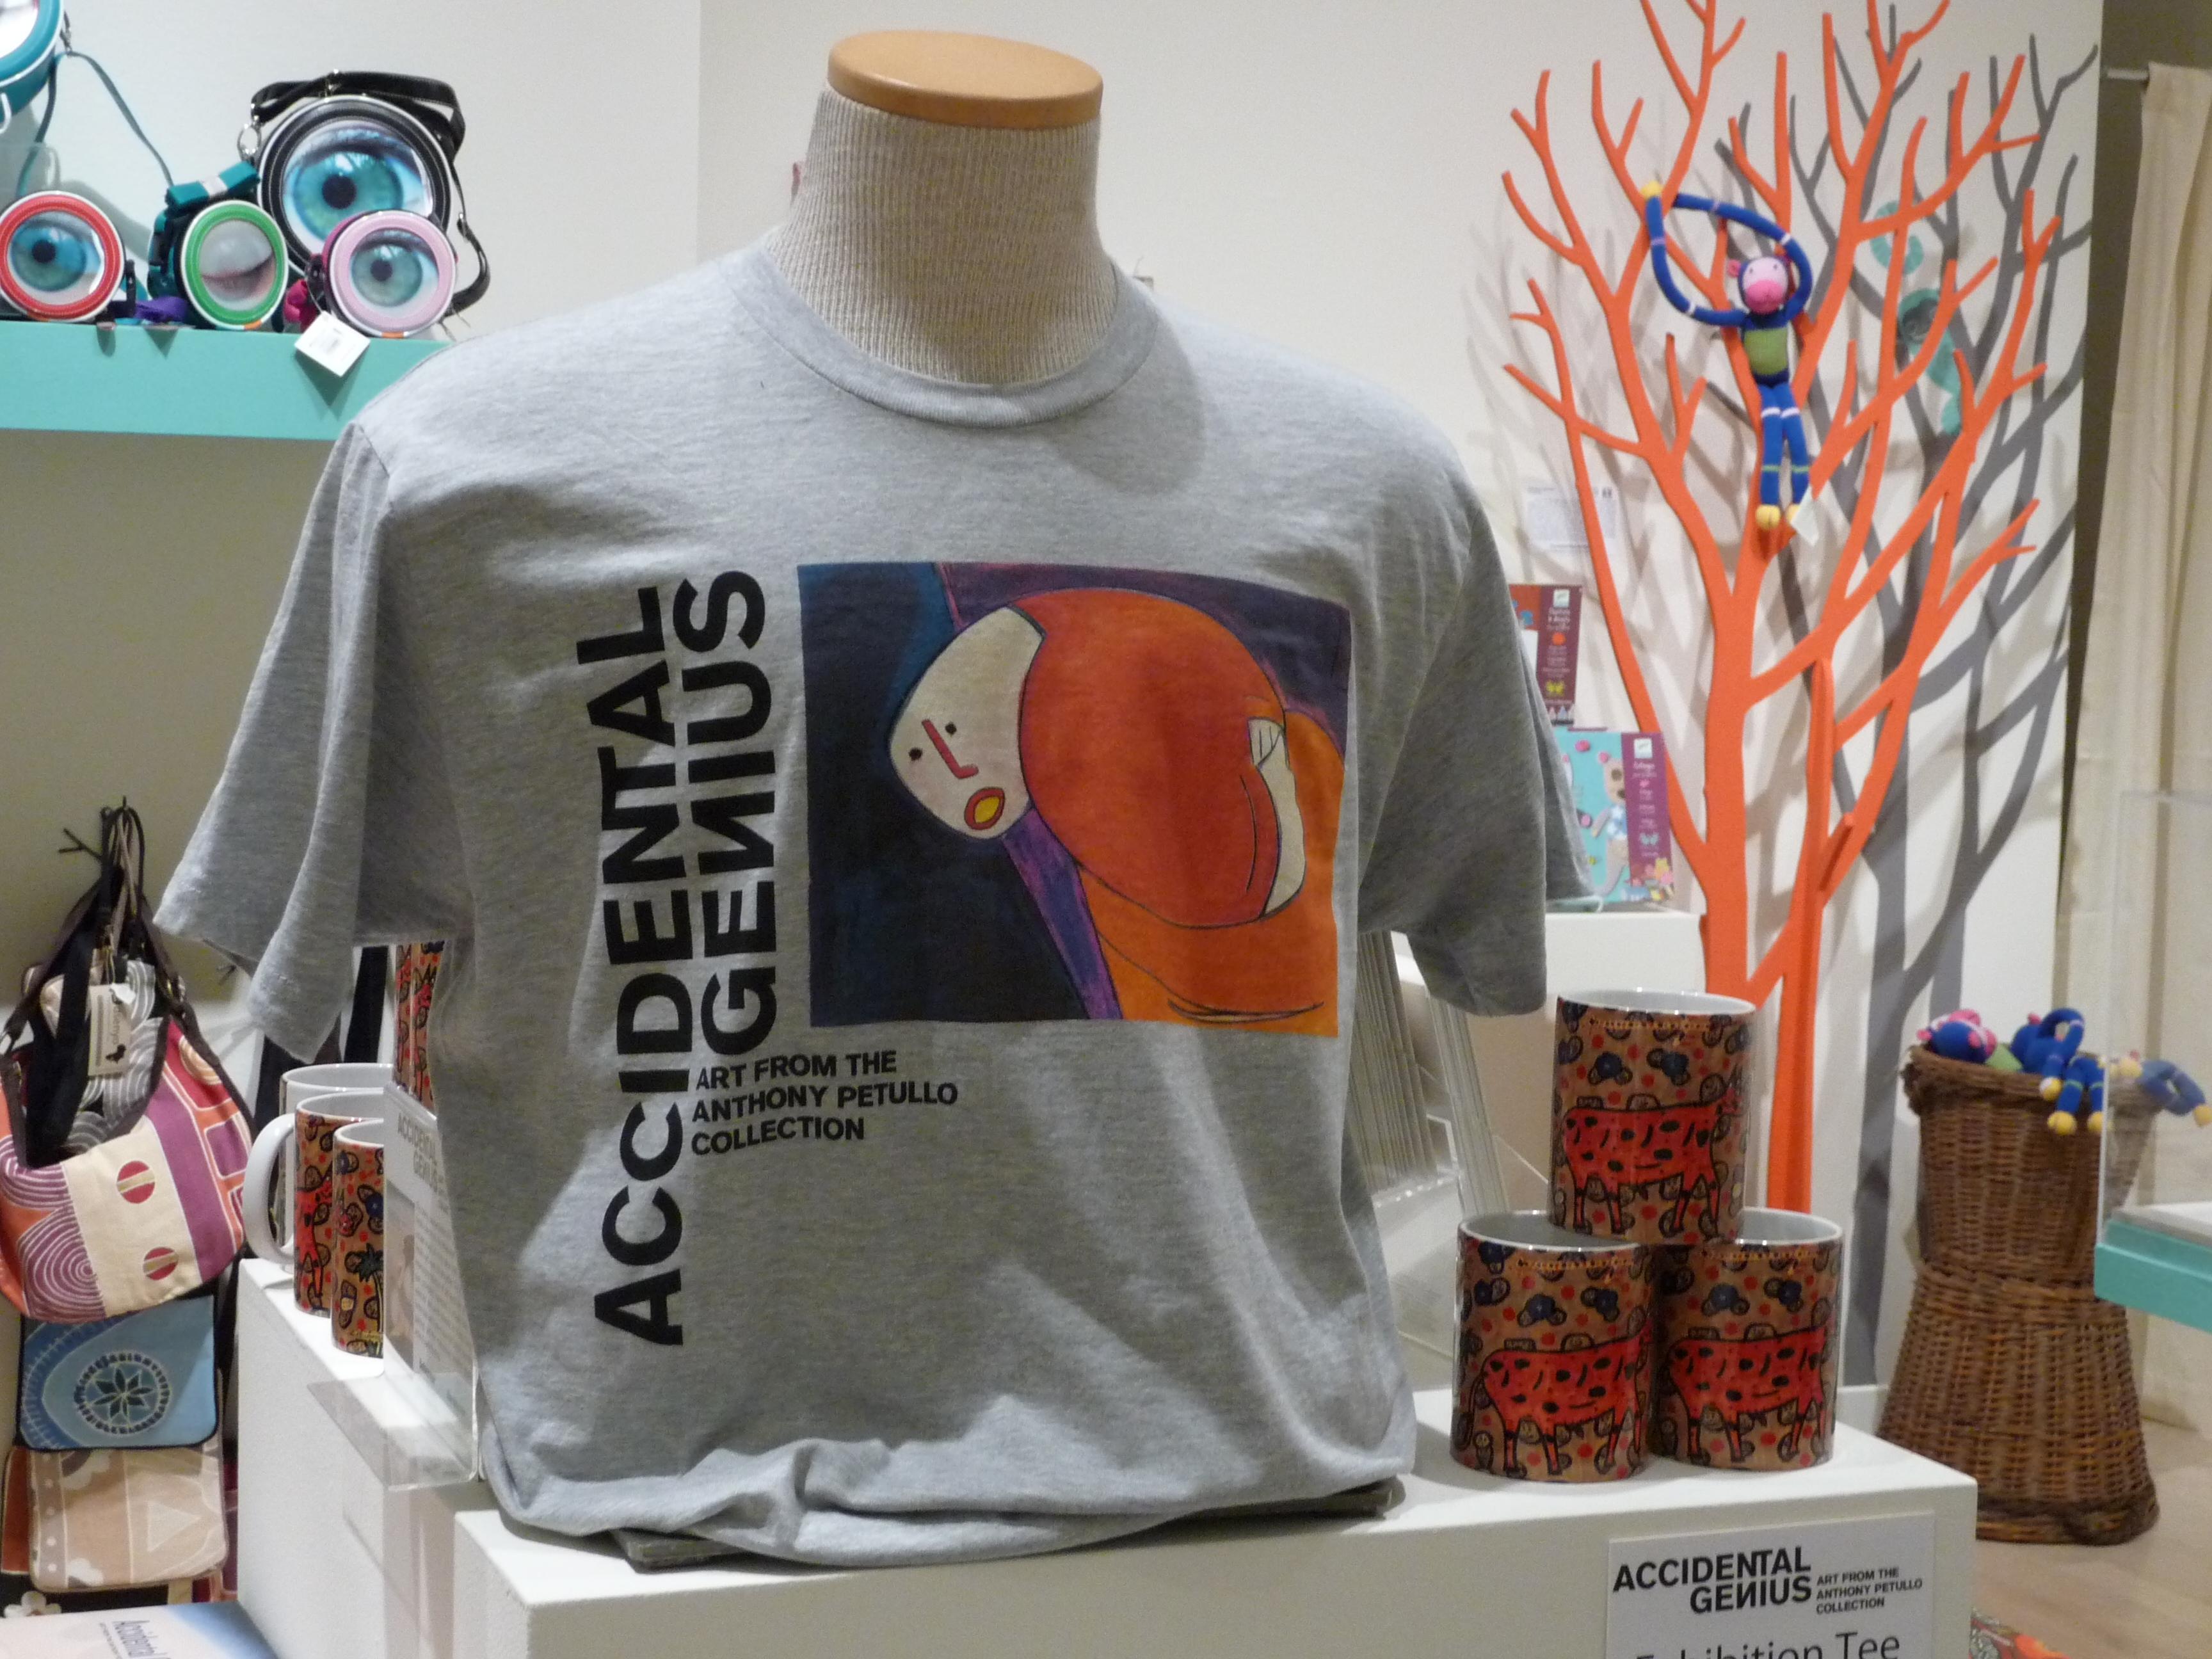 Exhibition T-shirt